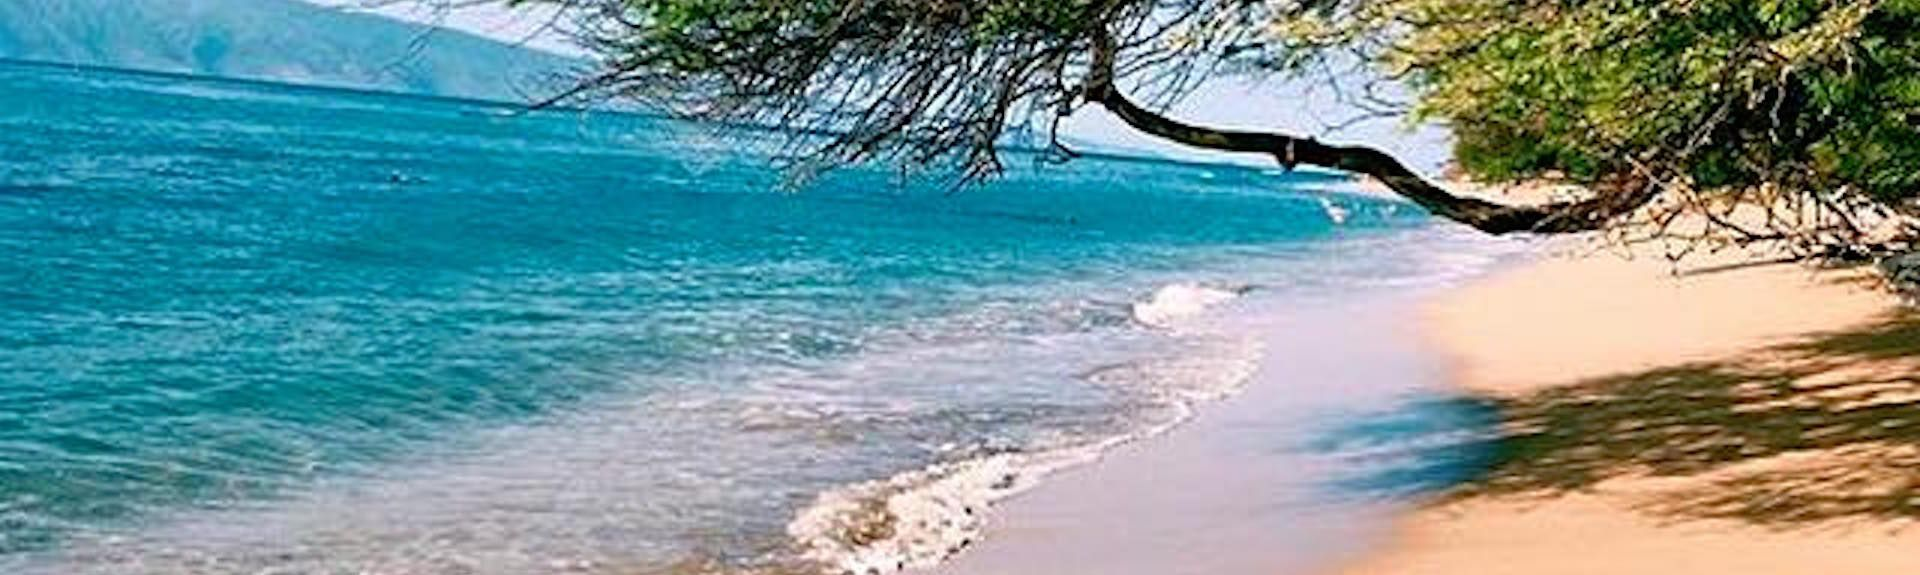 Westin Ka'anapali Ocean Resort Villas (Kaanapali, Hawaii, United States)